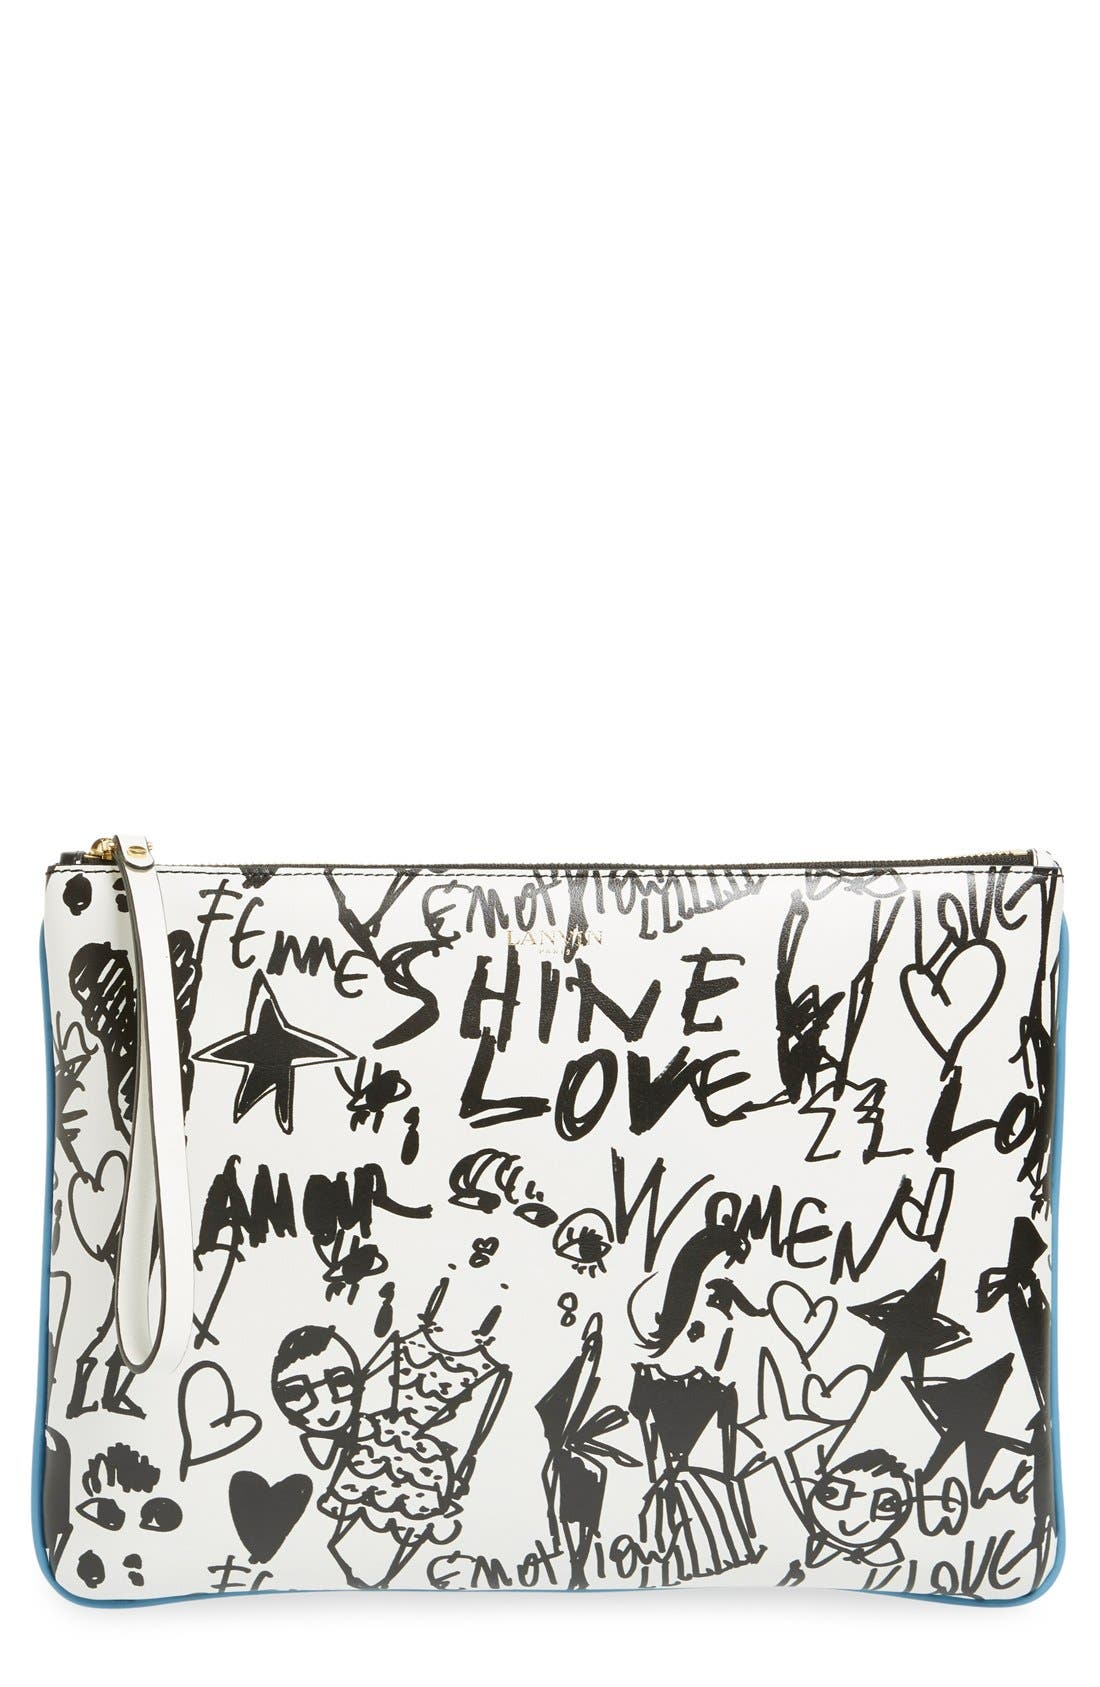 Alternate Image 1 Selected - Lanvin 'Medium' Print Calfskin Clutch